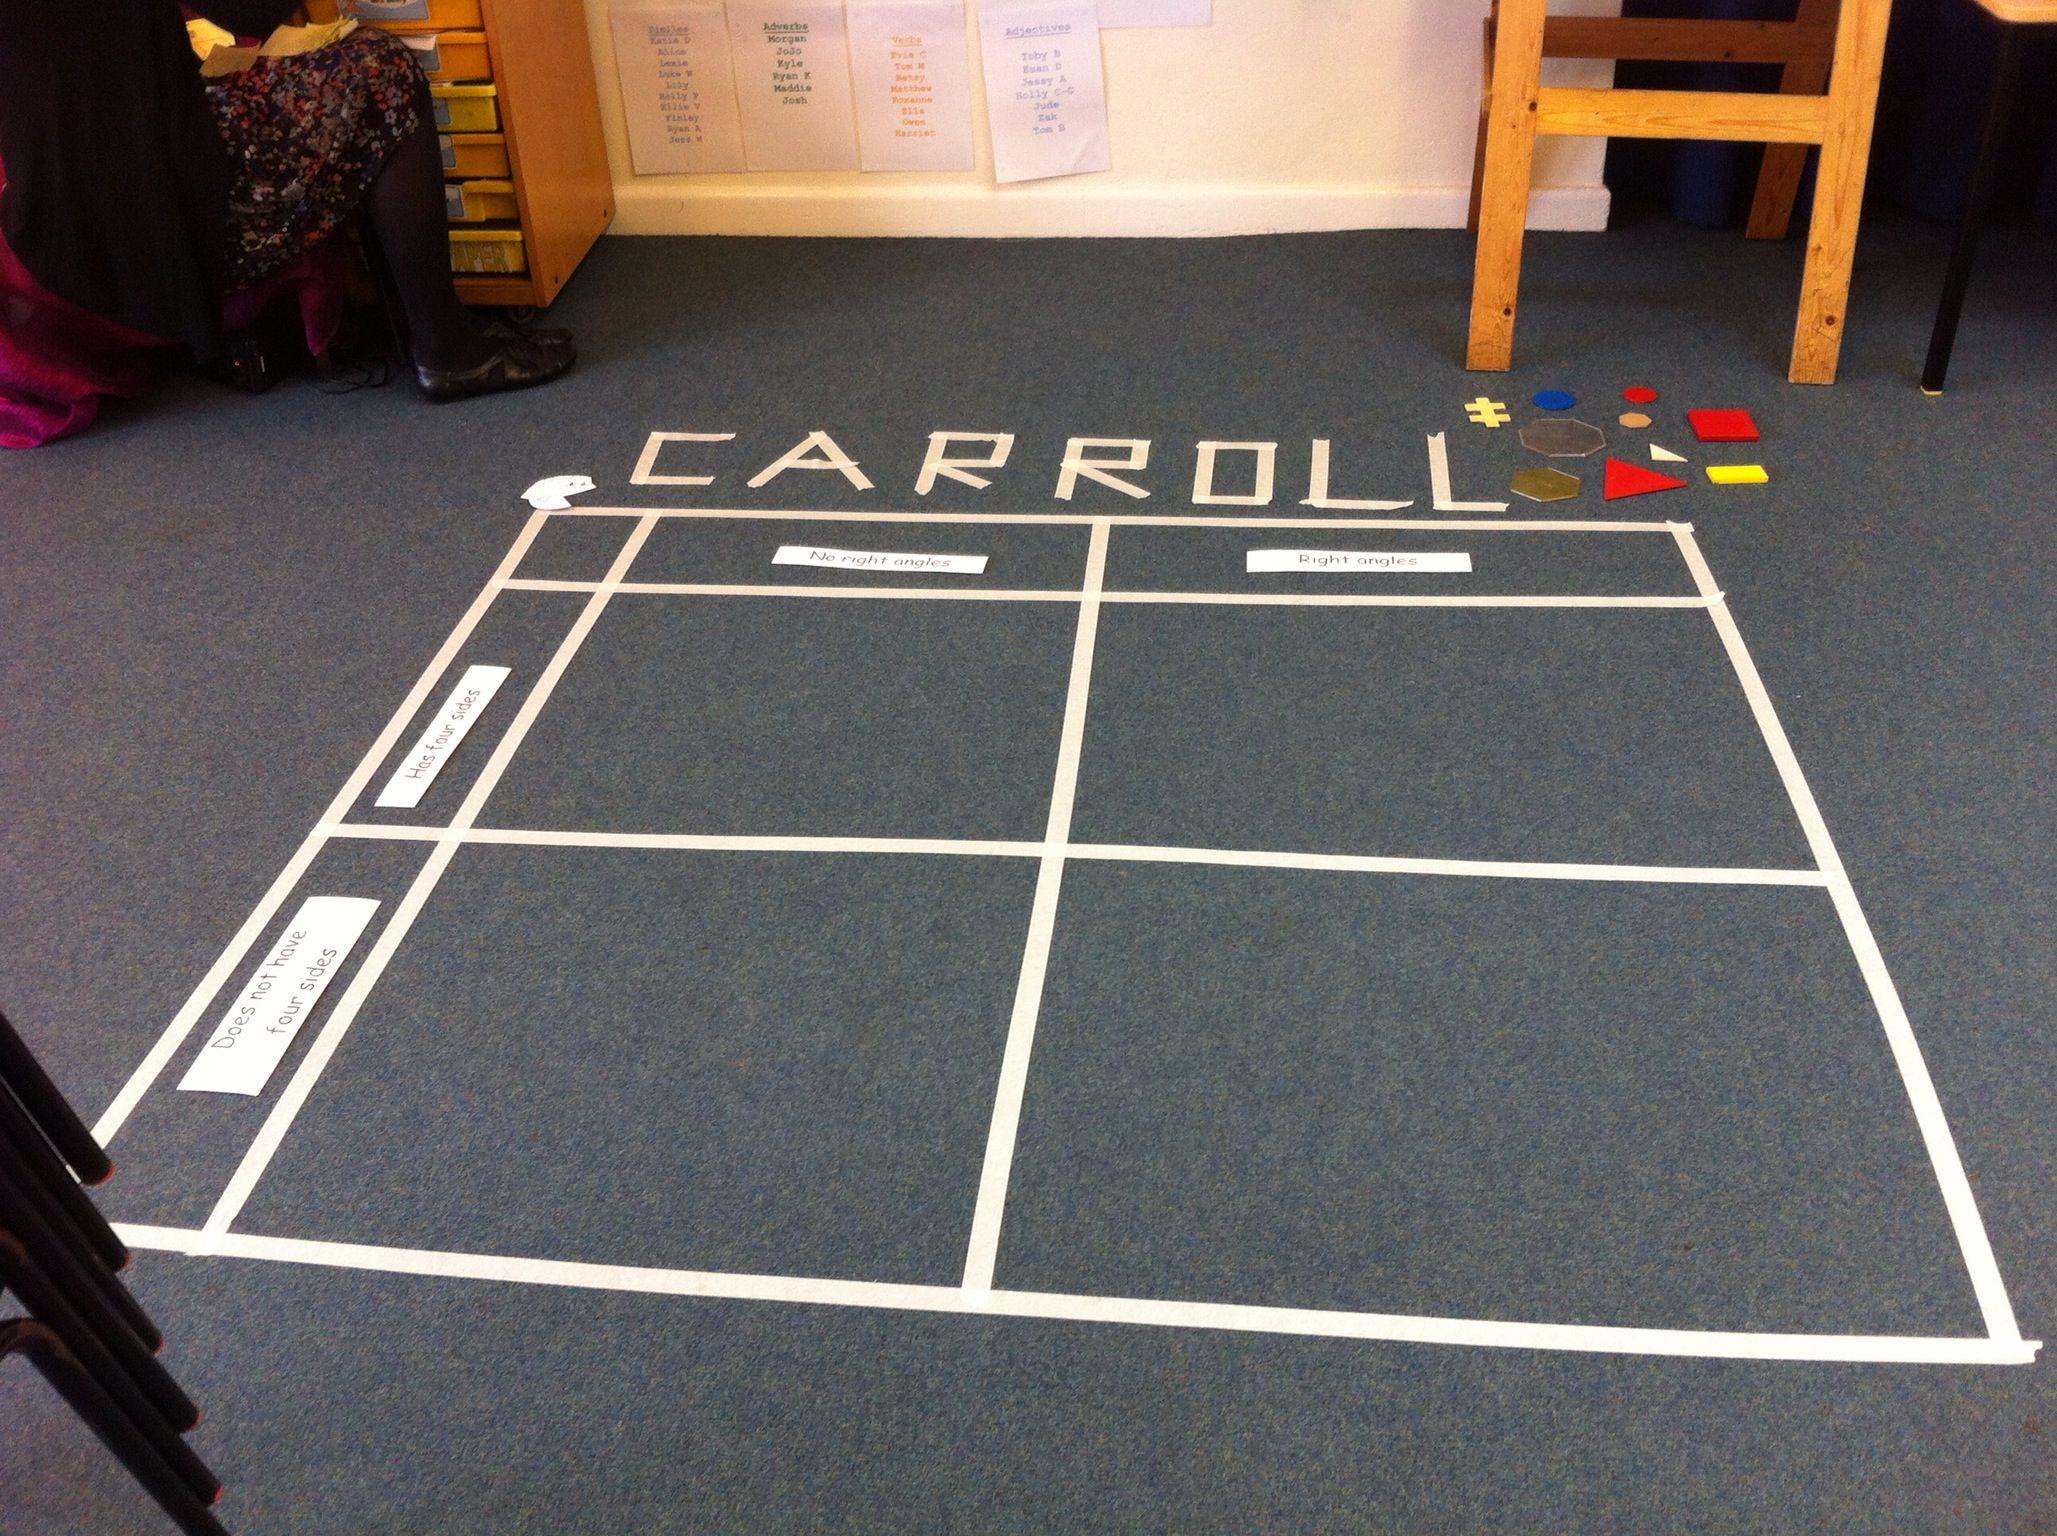 Carroll diagrams using masking tape on floor ofsted outstanding carroll diagrams using masking tape on floor ofsted outstanding pooptronica